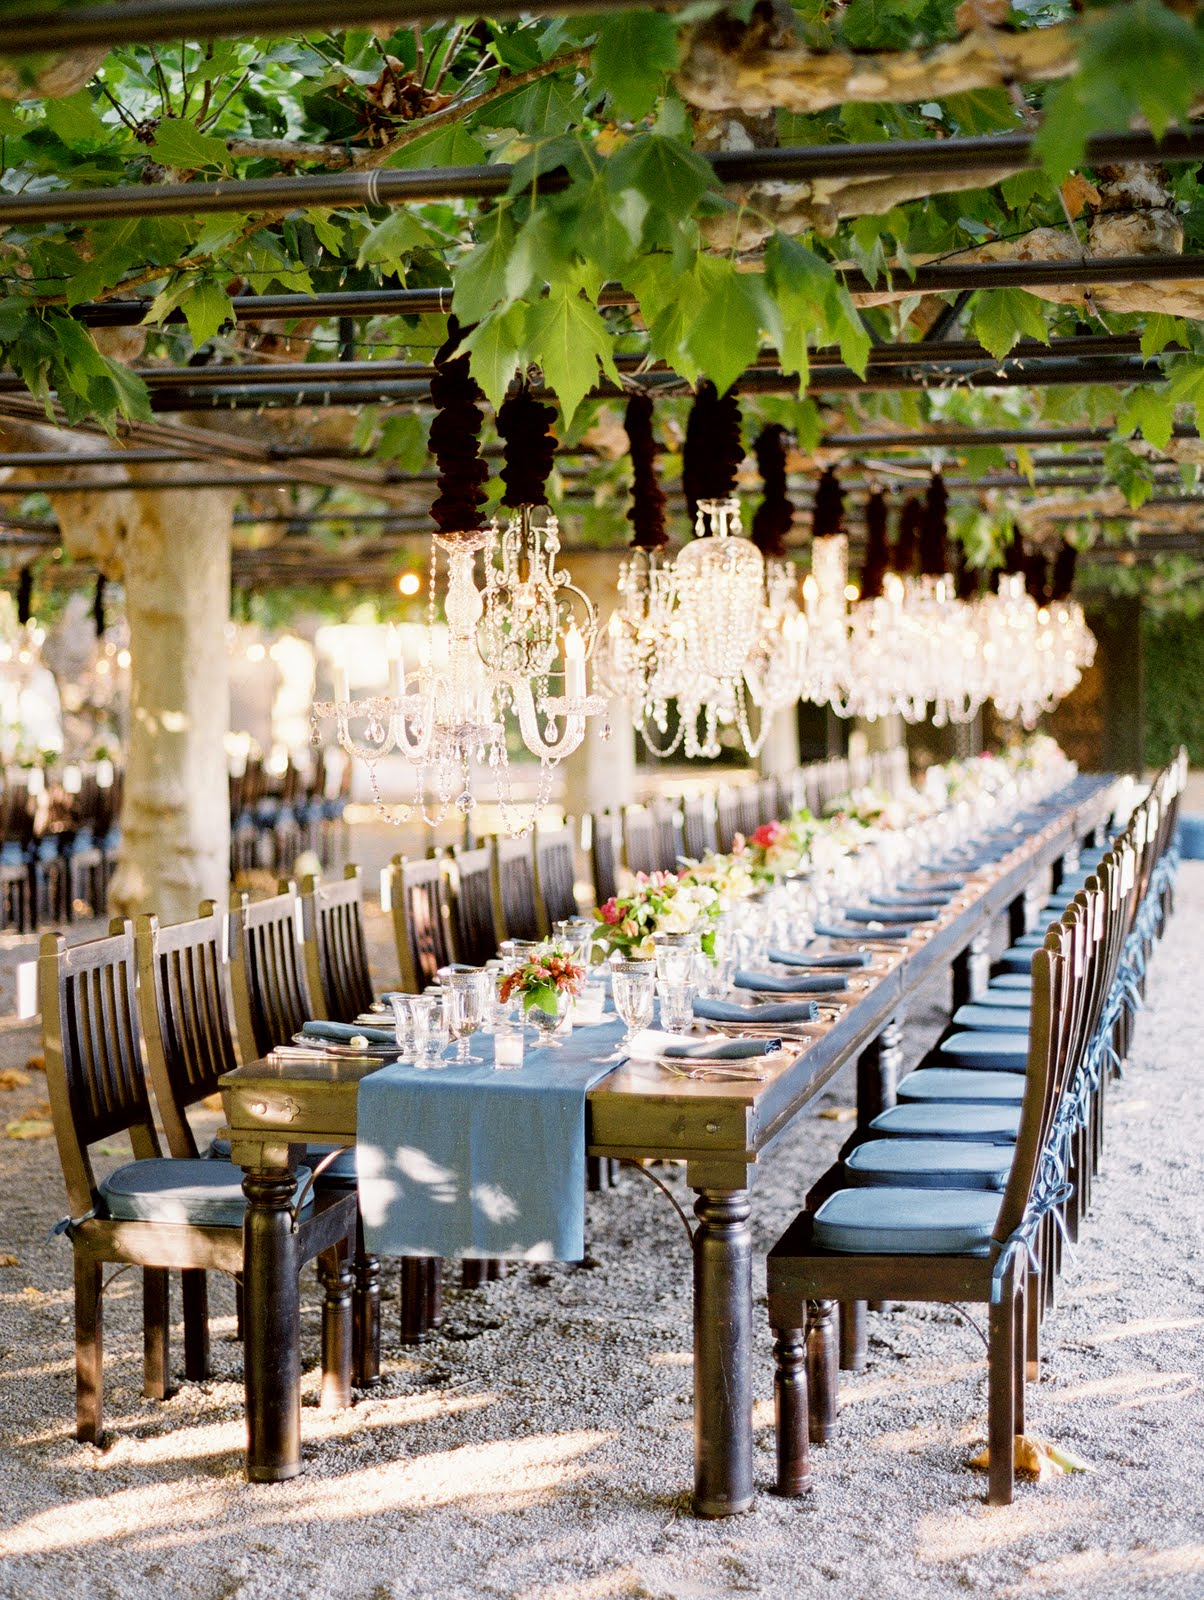 Vineyard Wedding Idea Lookbook Dream Weddings Start Here